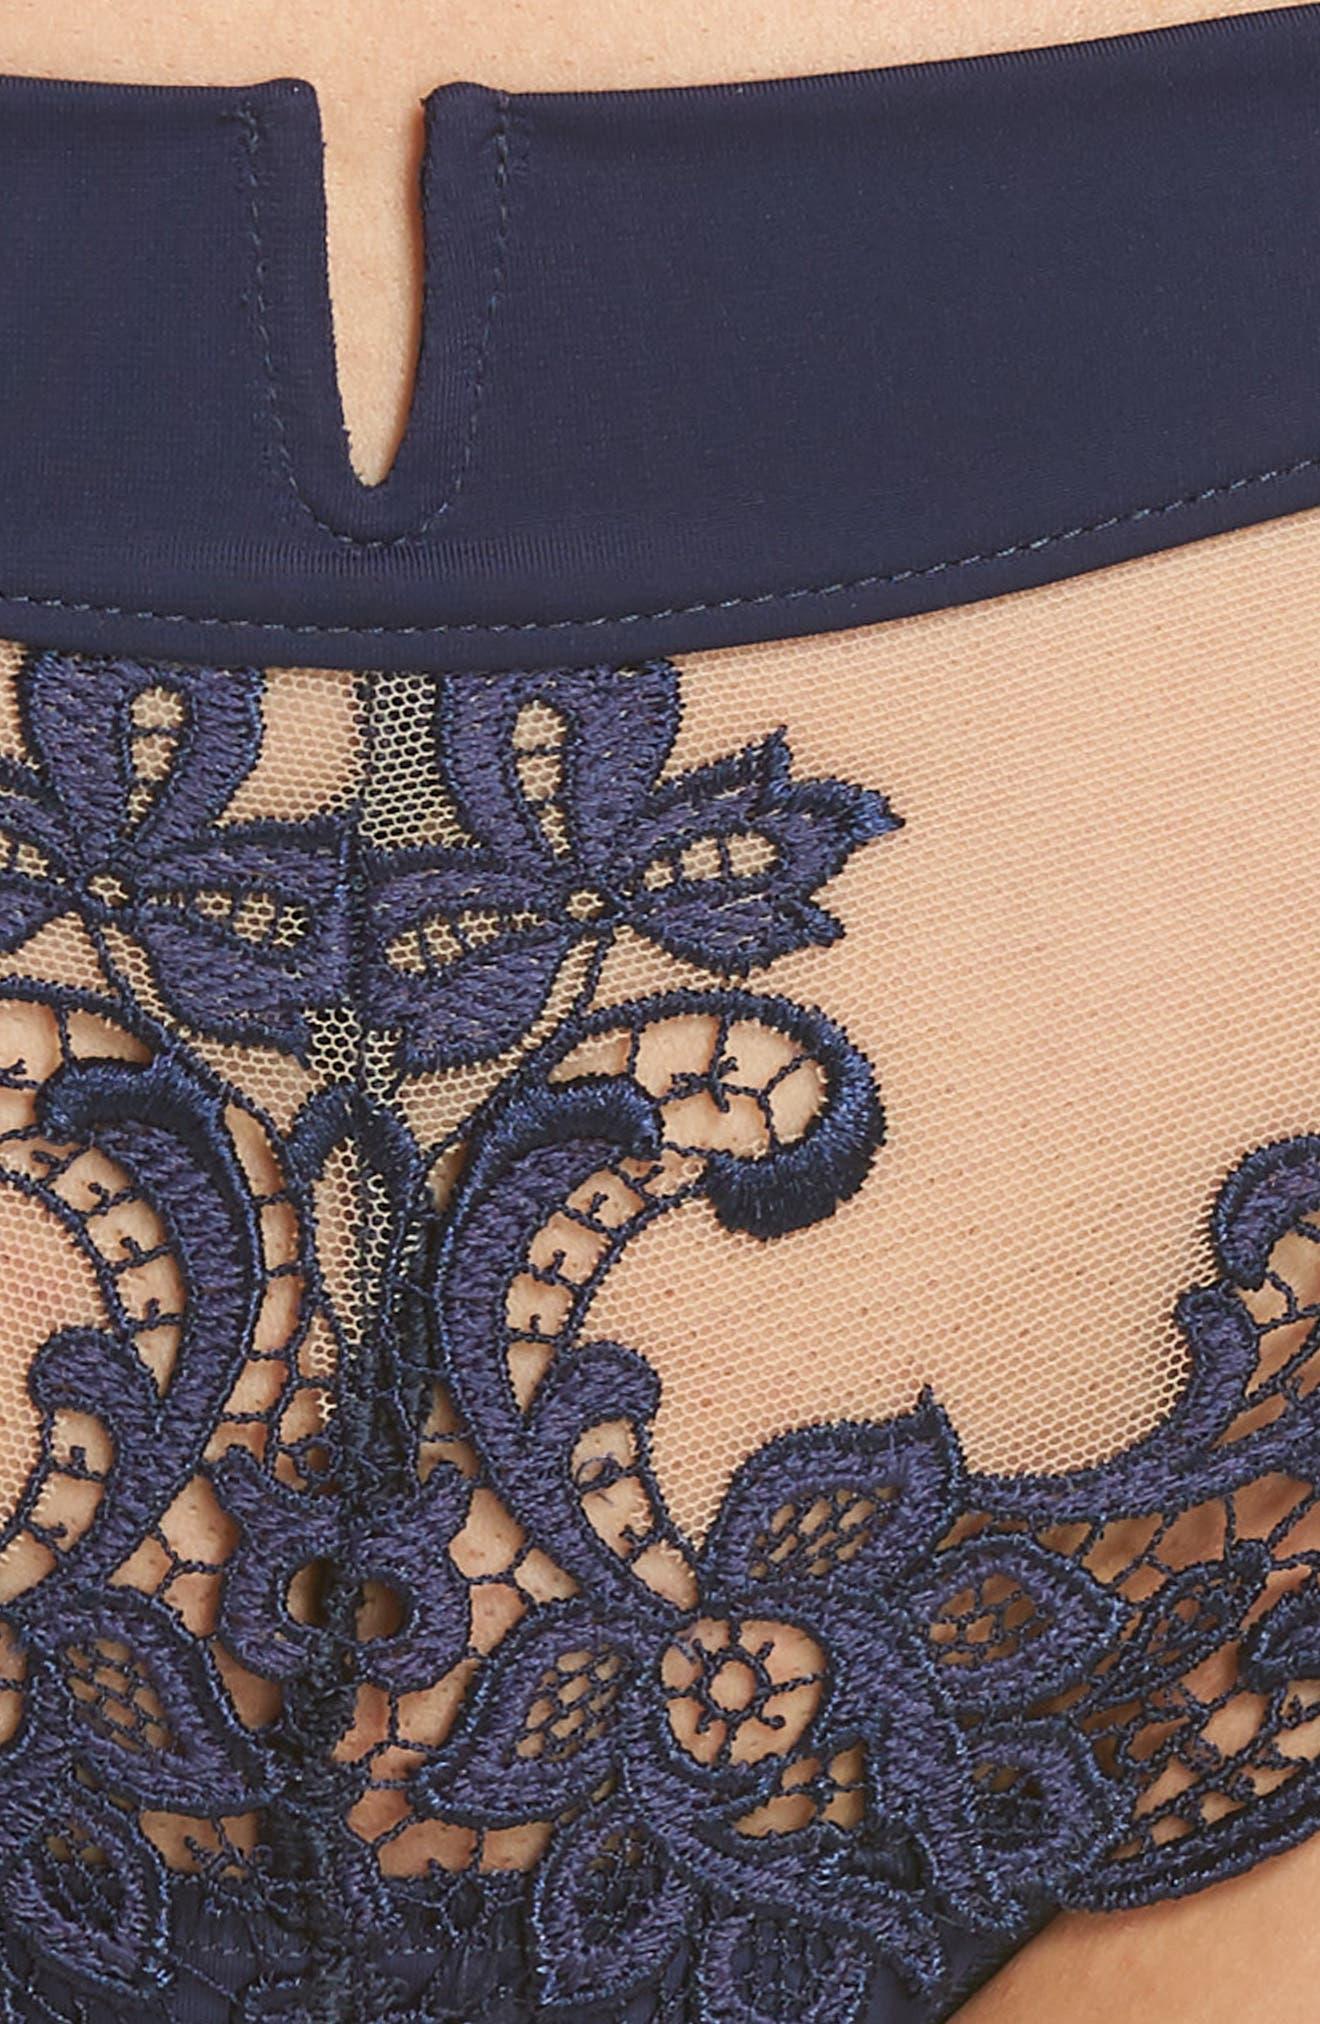 'Saga' Embroidered Boyshort Briefs,                             Alternate thumbnail 5, color,                             NAVY